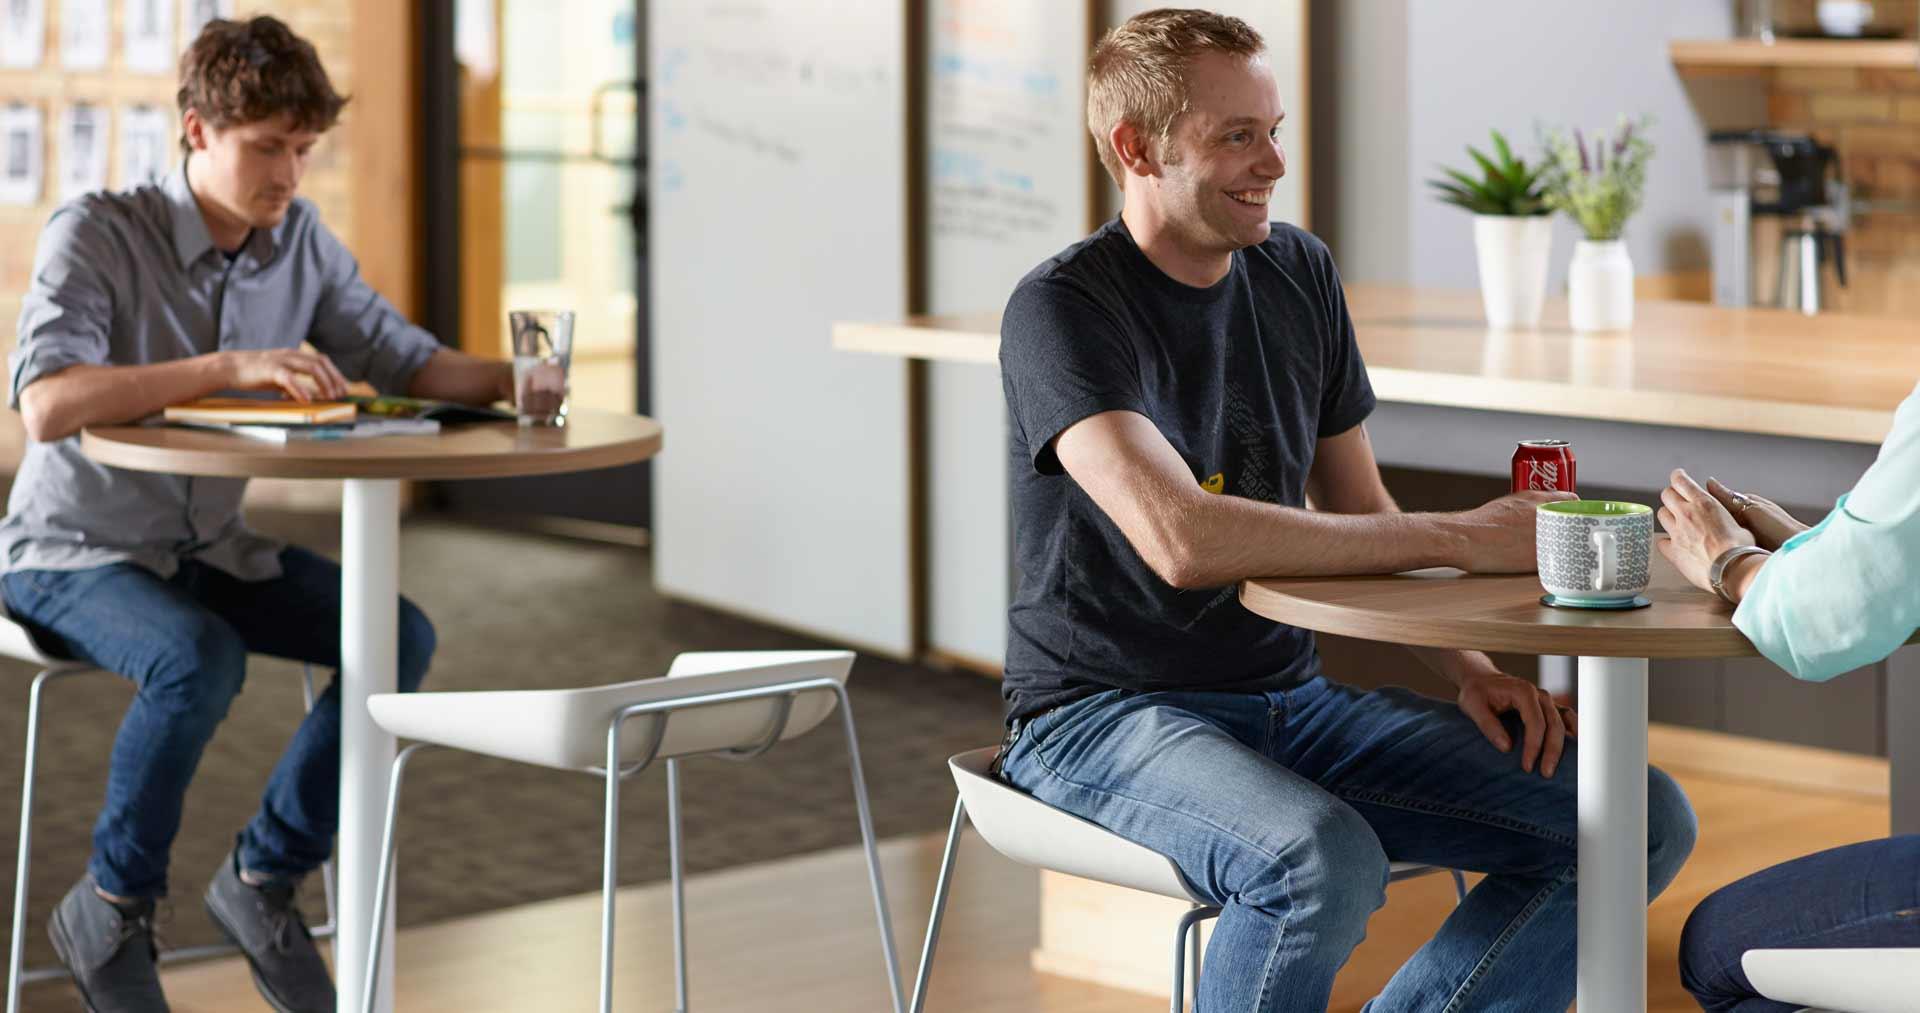 simple-tables-scoop-stools-people-13-0004588-dl16_